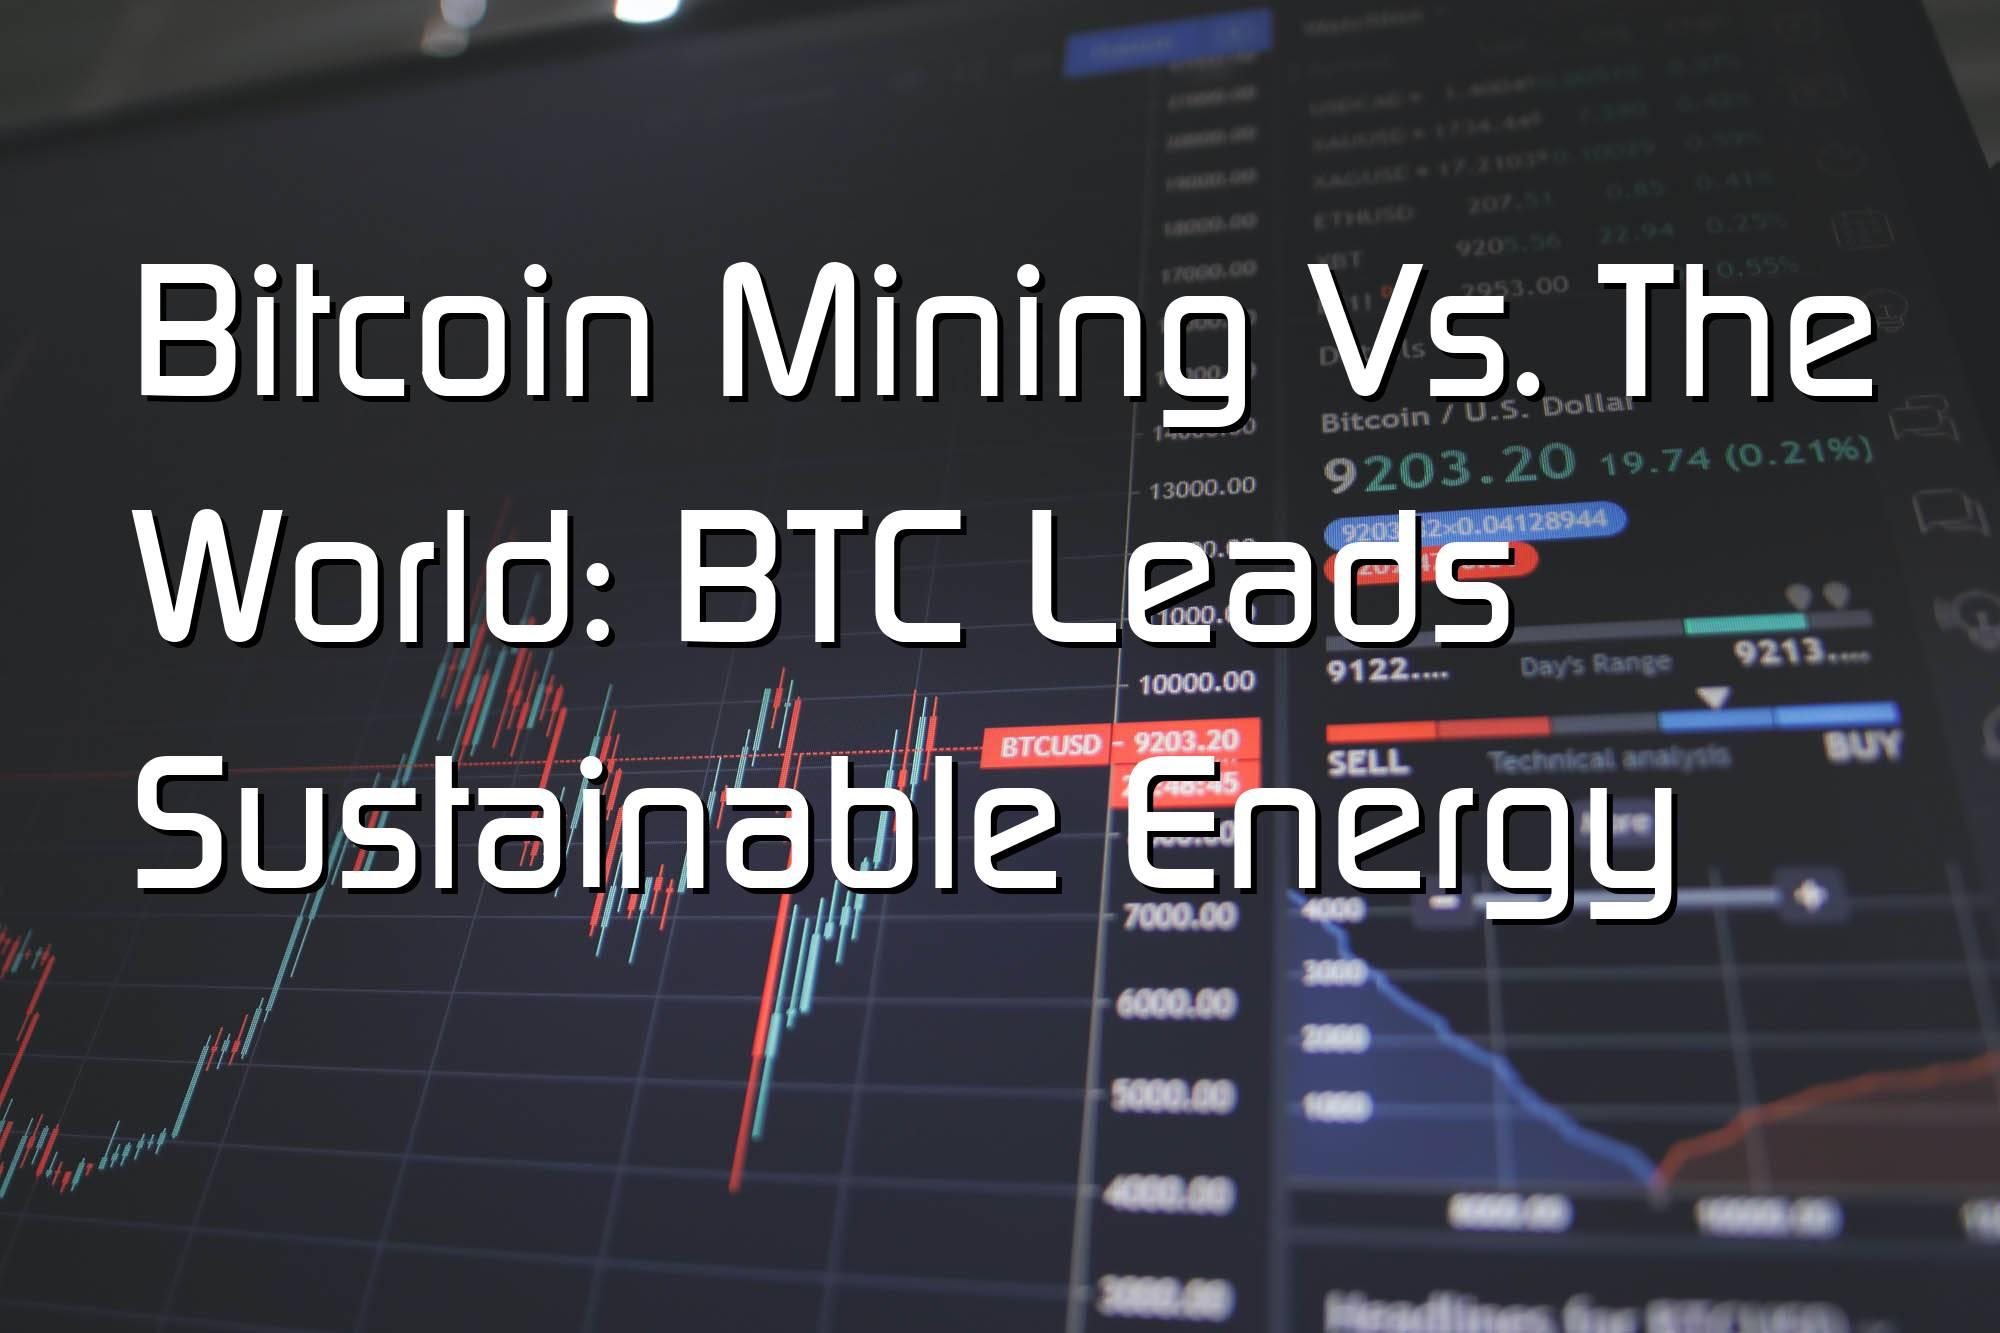 @$60566: Bitcoin Mining Vs. The World: BTC Leads Sustainable Energy